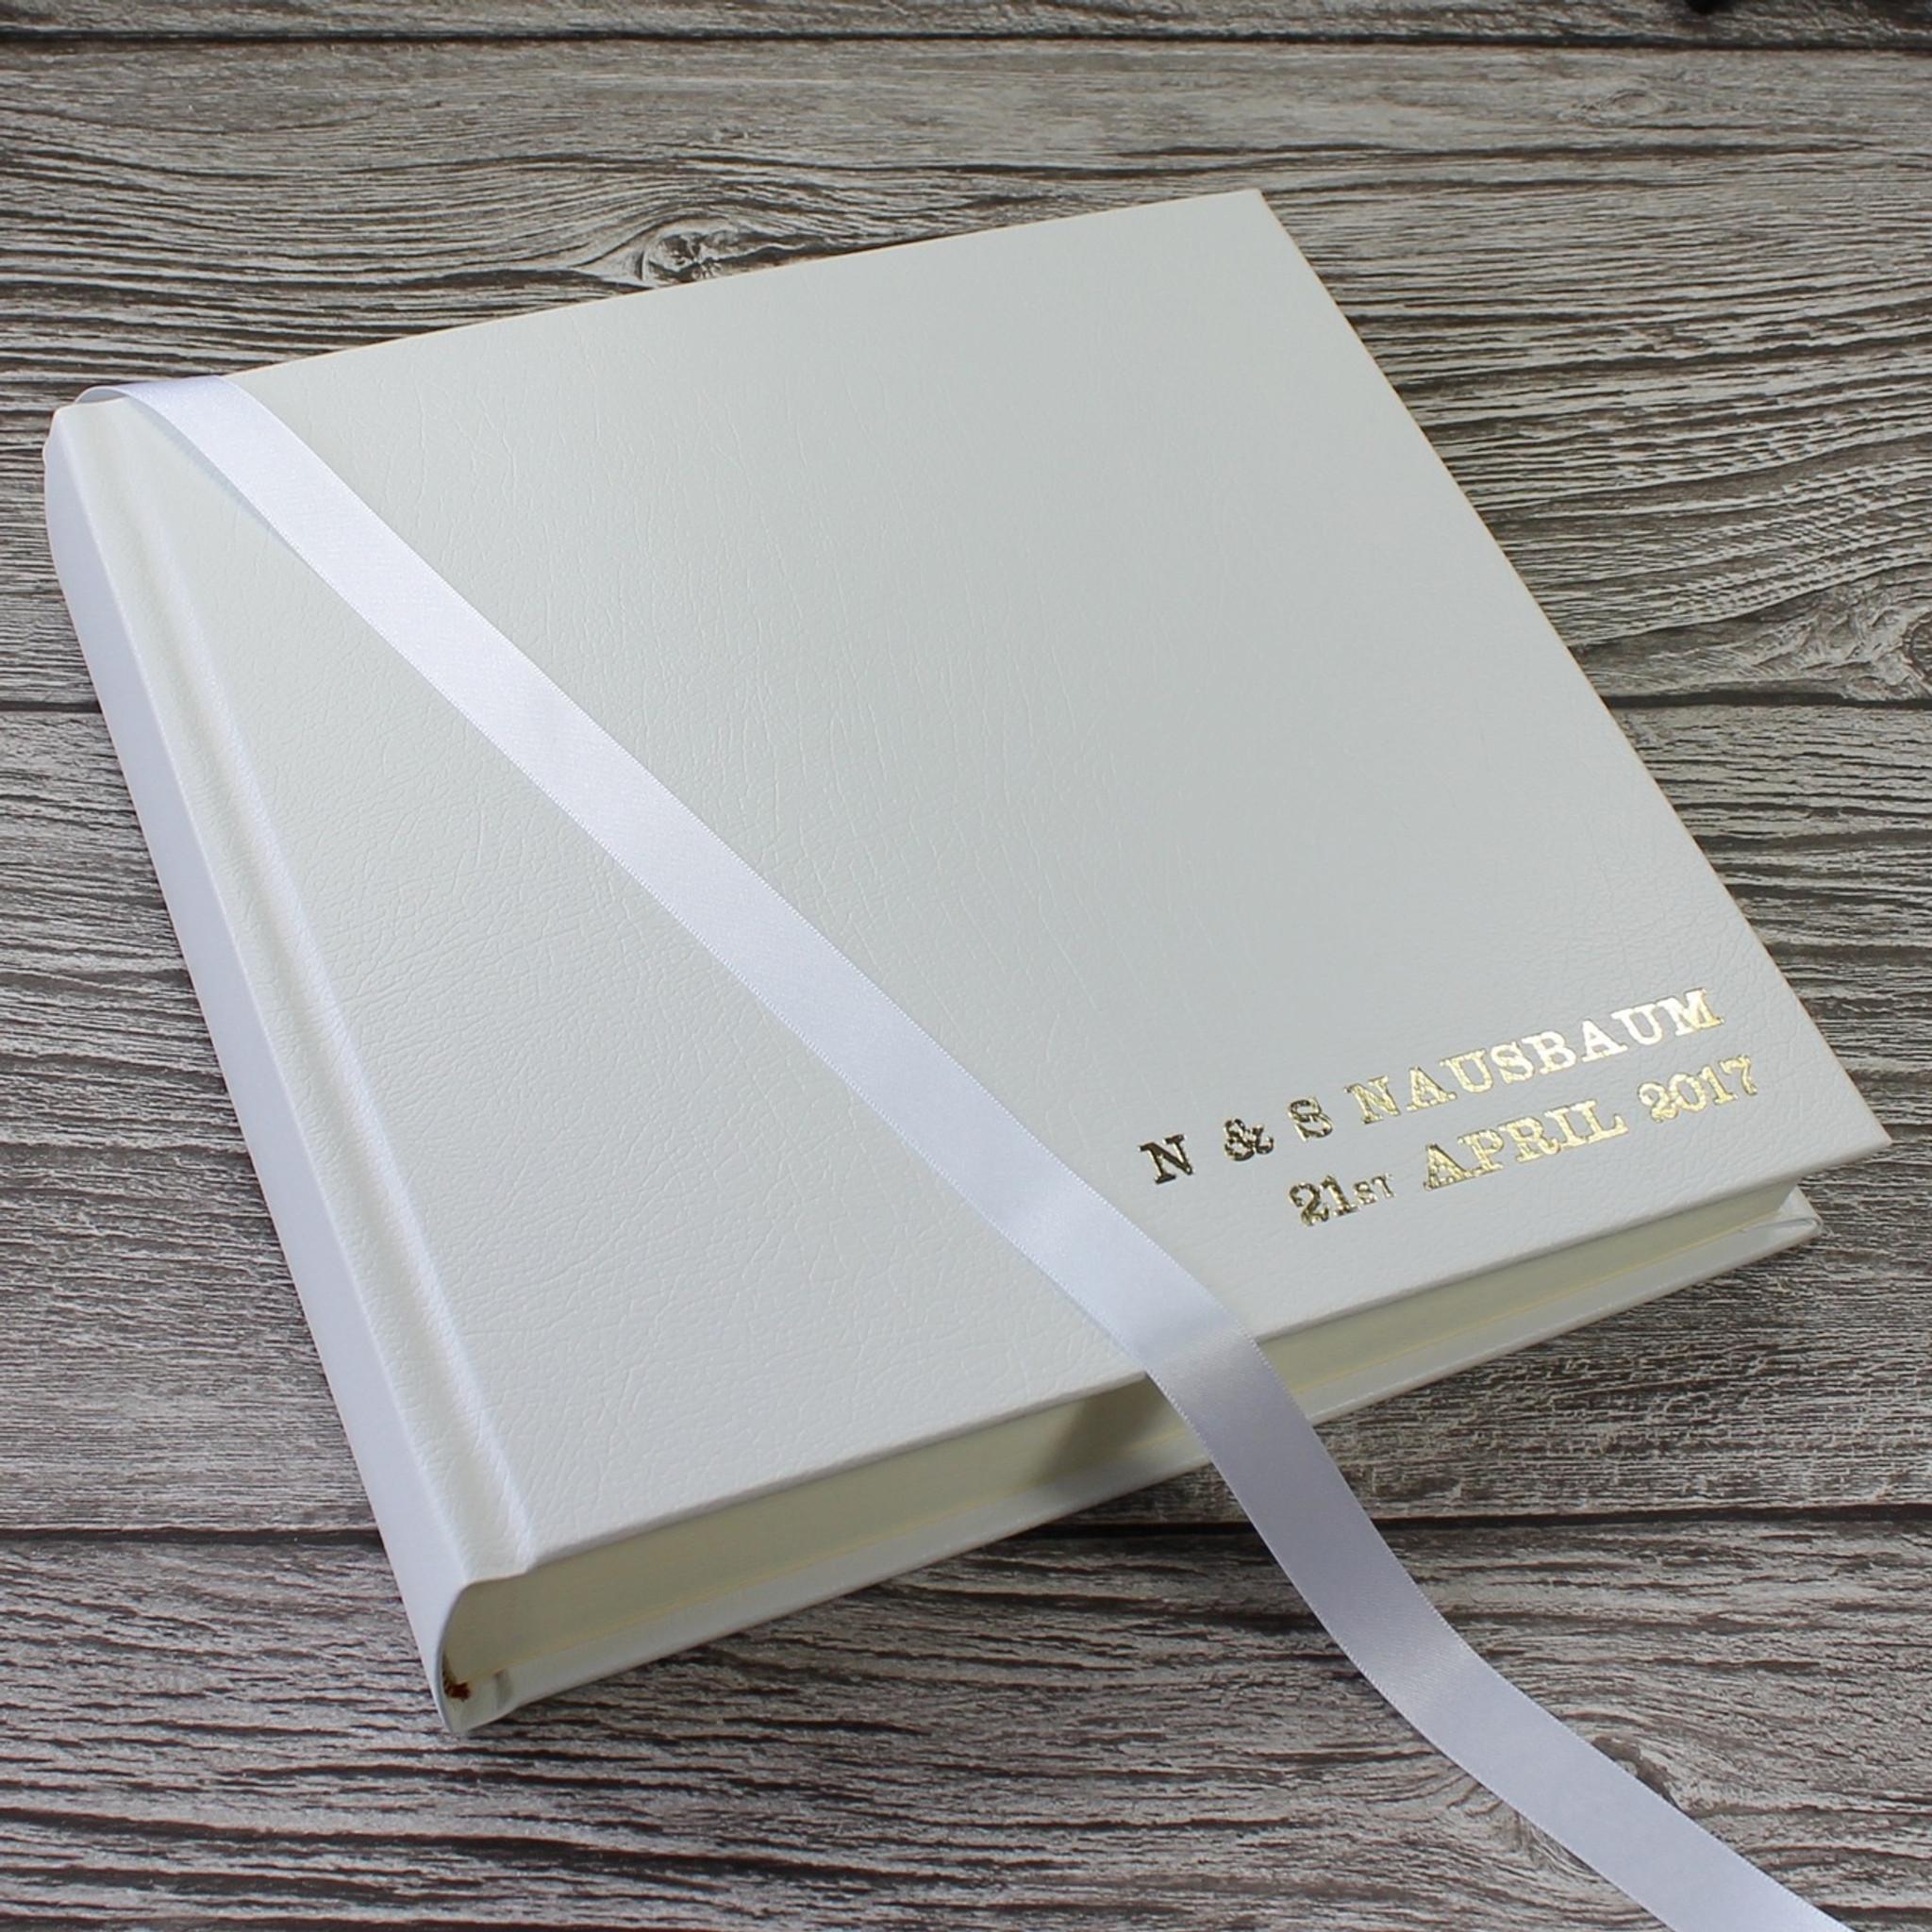 classic white leather wedding photo album white leather. Black Bedroom Furniture Sets. Home Design Ideas